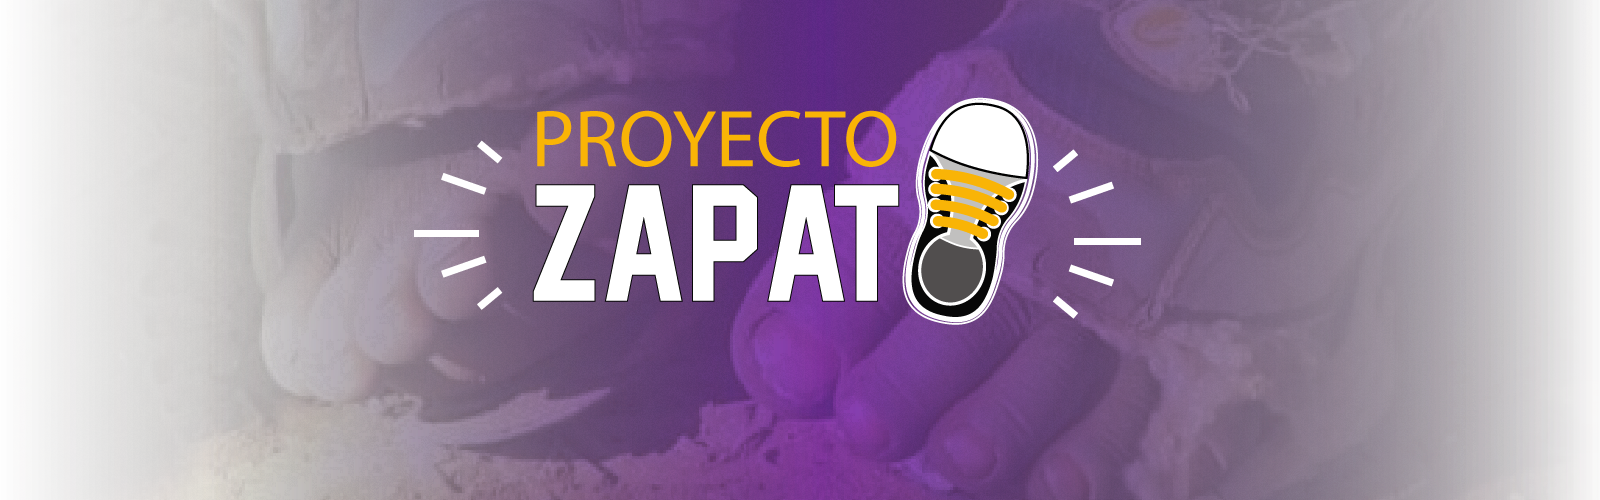 proyecto_zapato_p1